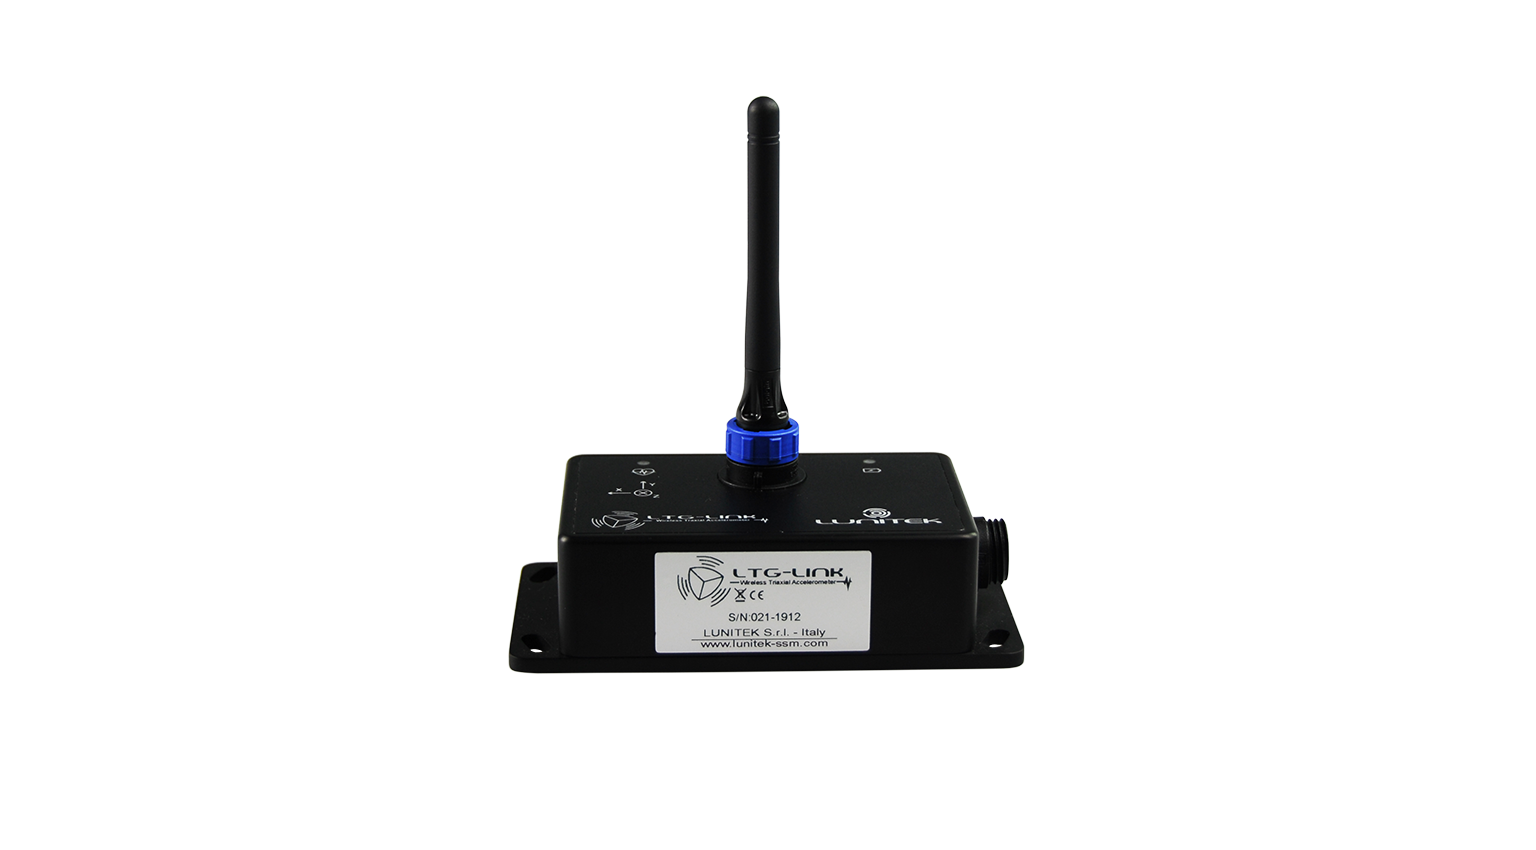 LUNITEK GNSS MONITORING LTG 160 00